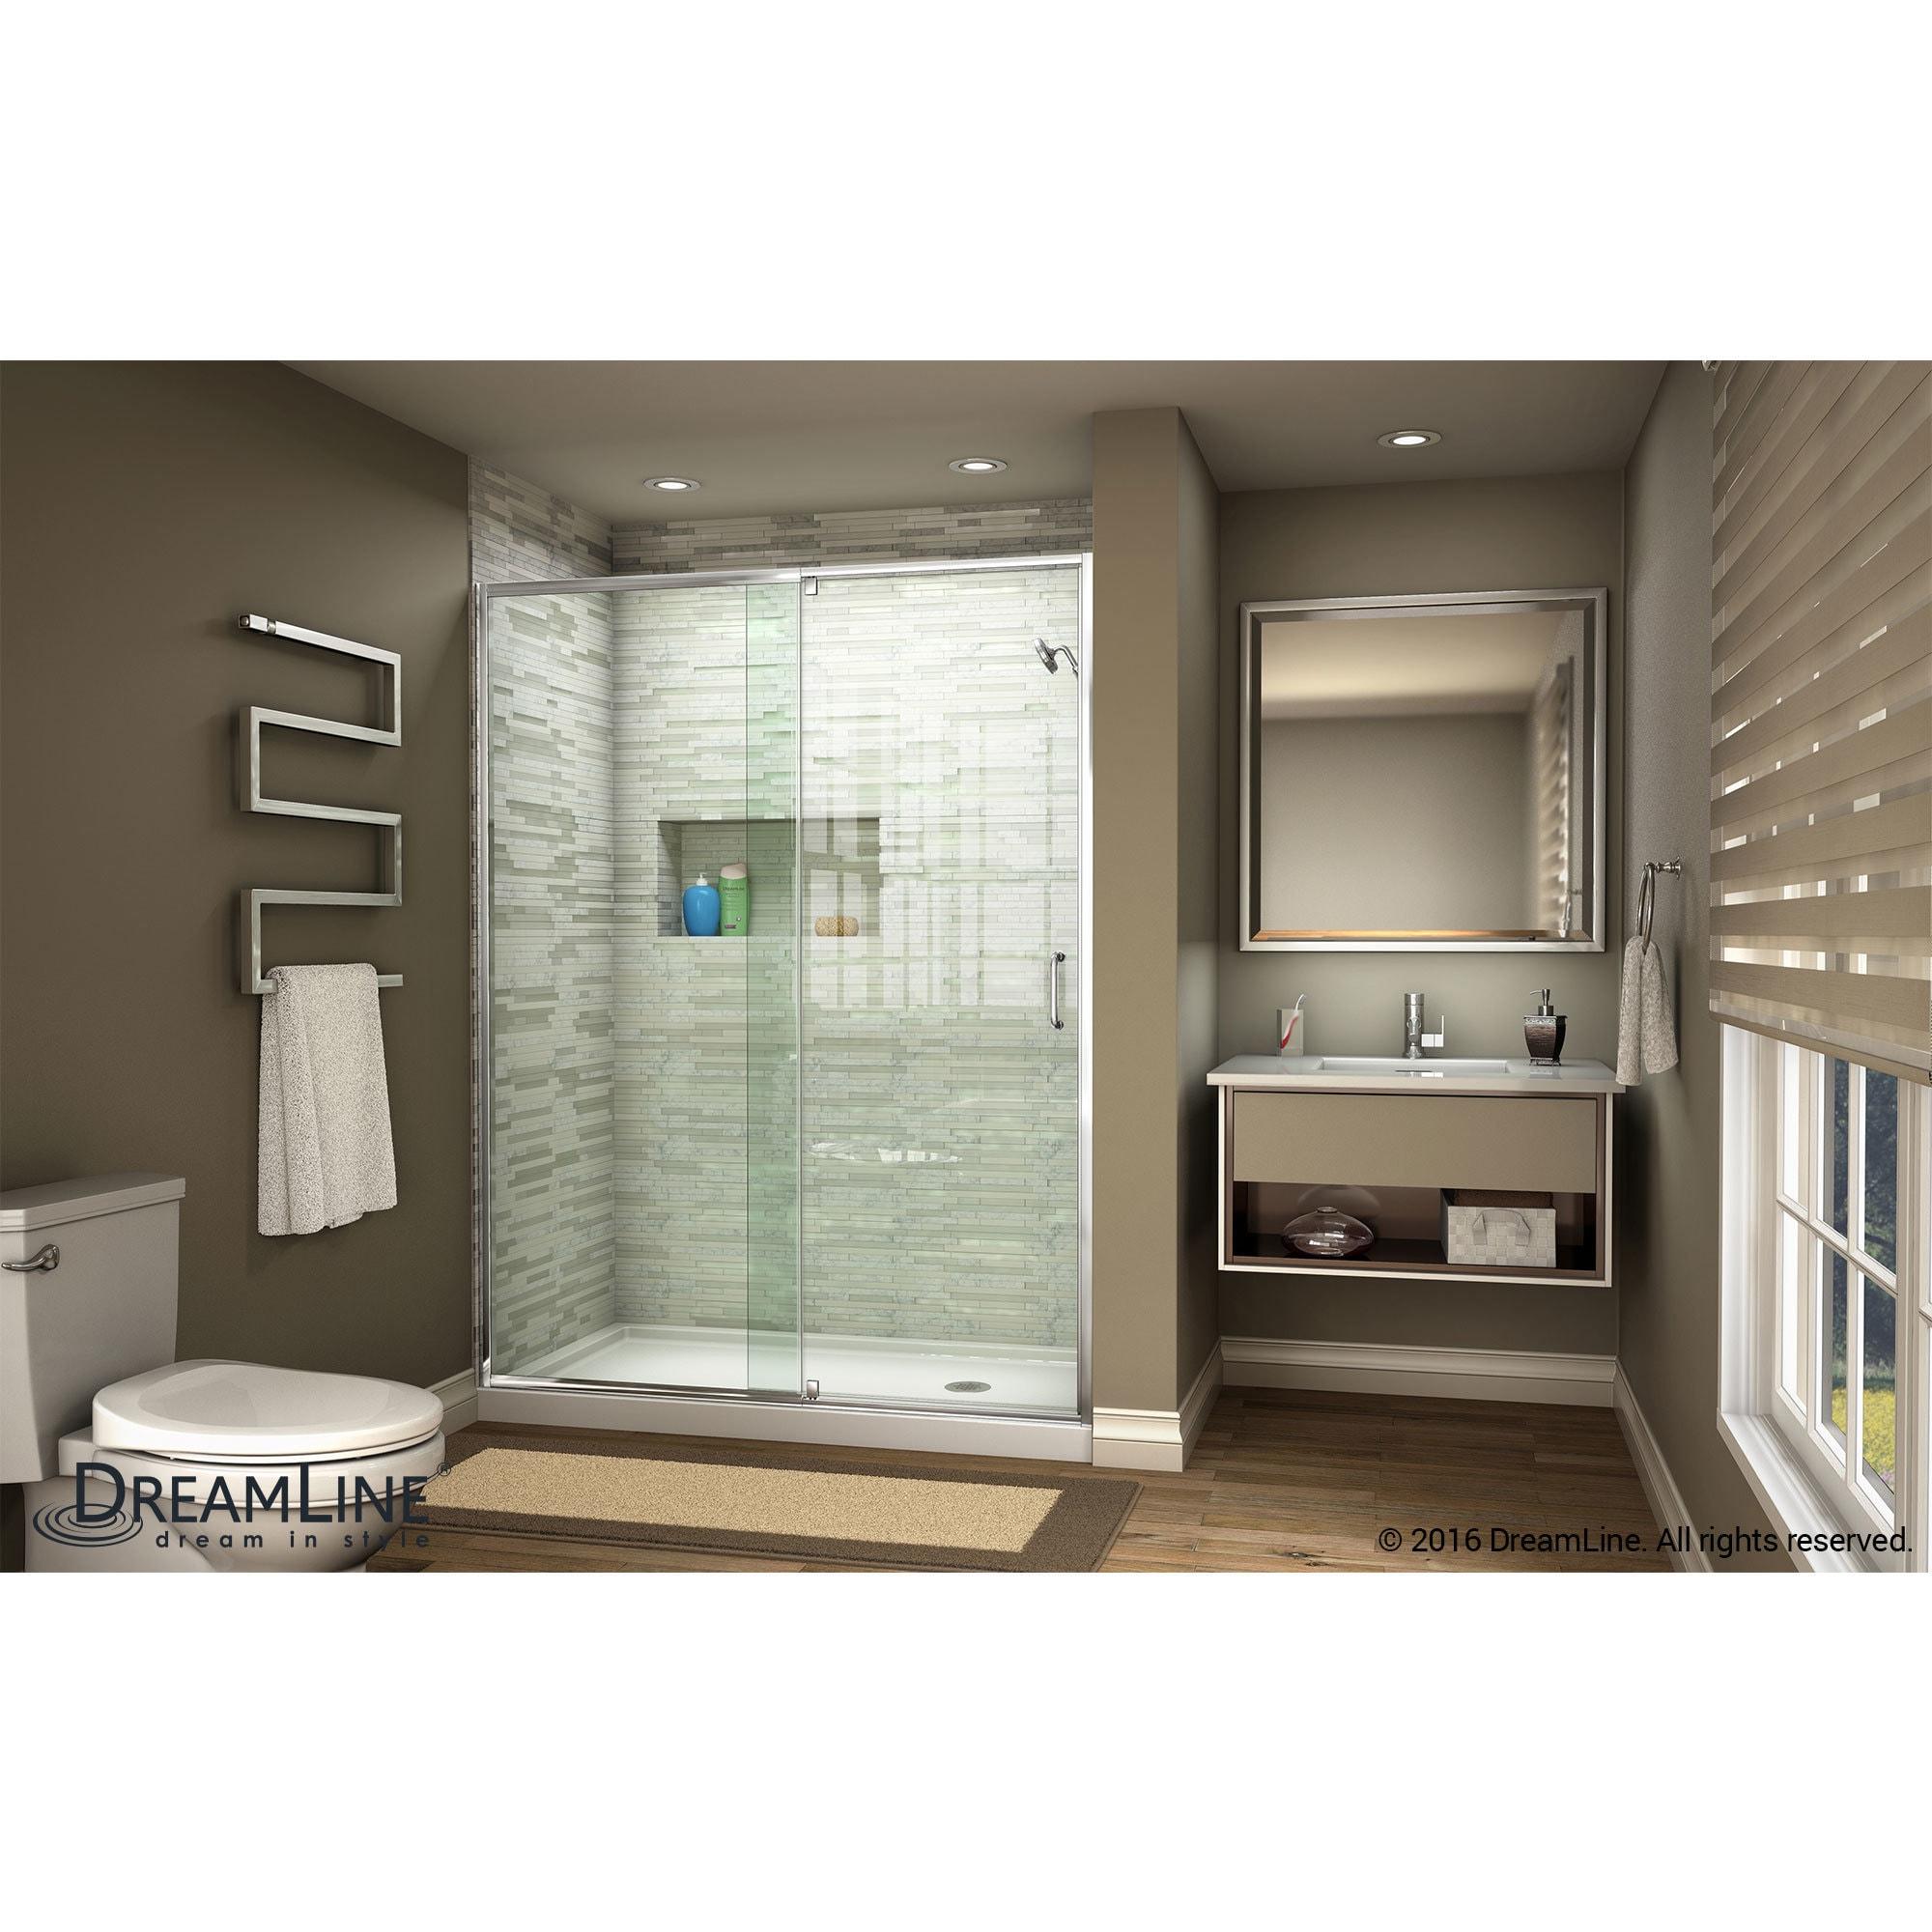 DreamLine Flex 44-48 in  W x 72 in  H Semi-Frameless Pivot Shower Door -  44